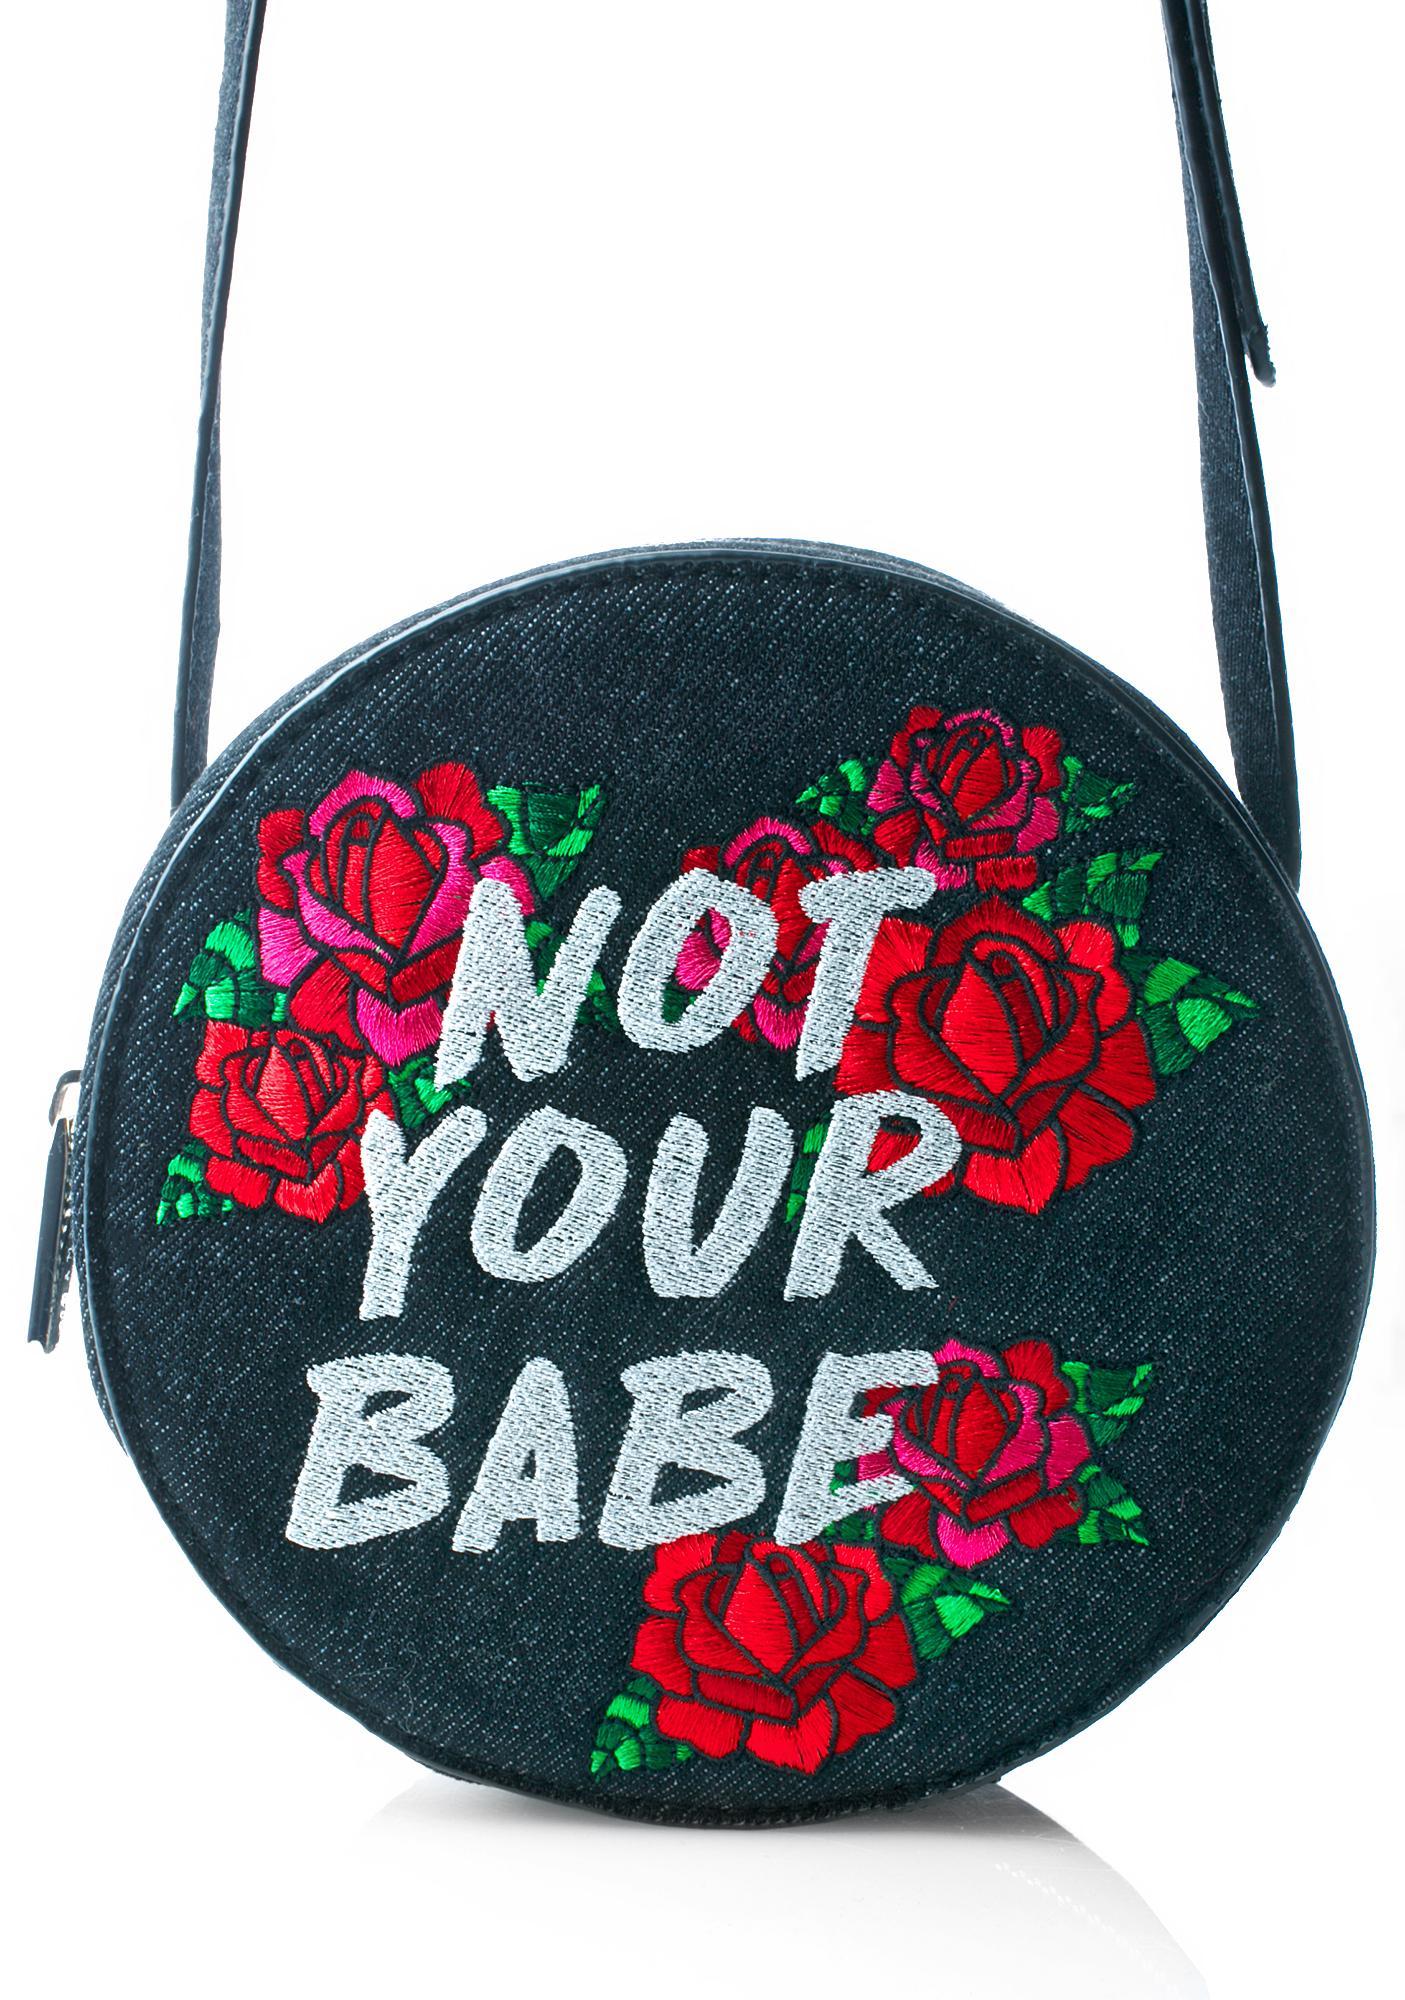 Skinnydip Not Your Babe Crossbody Bag